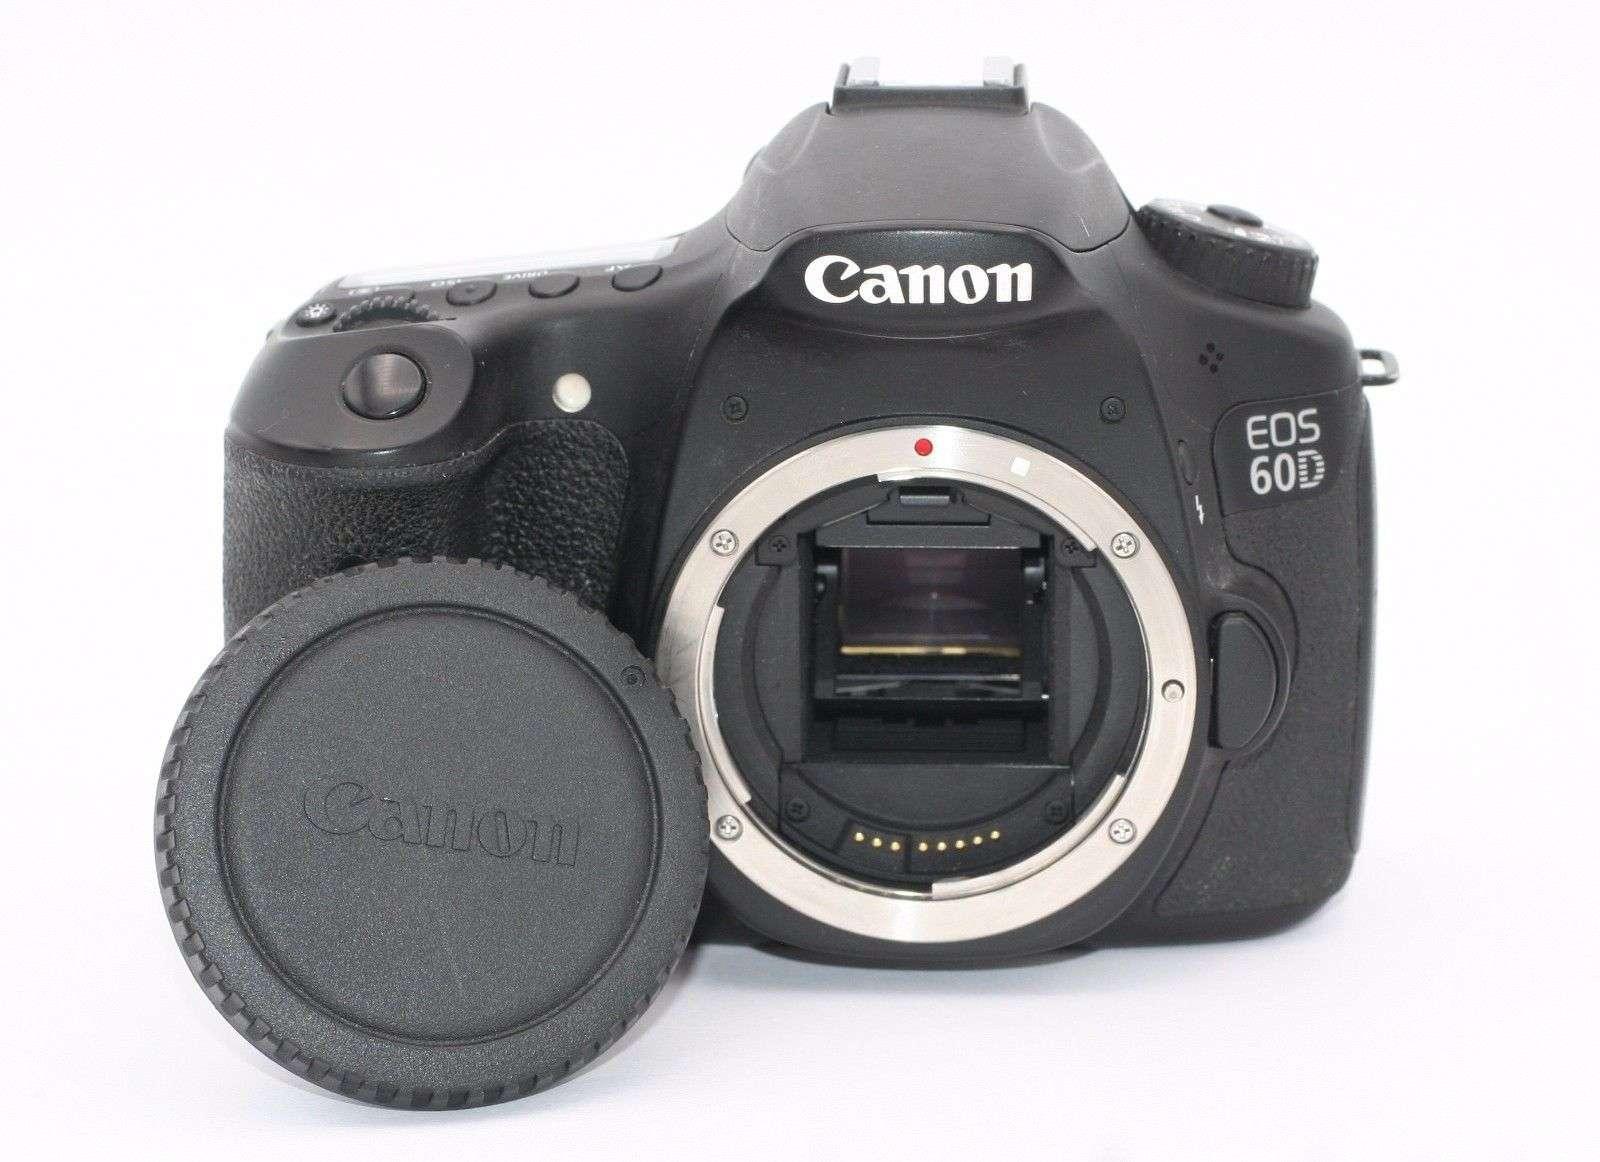 canon eos 60d 18 0mp digital slr camera black body only shutter count 3141 ebay. Black Bedroom Furniture Sets. Home Design Ideas